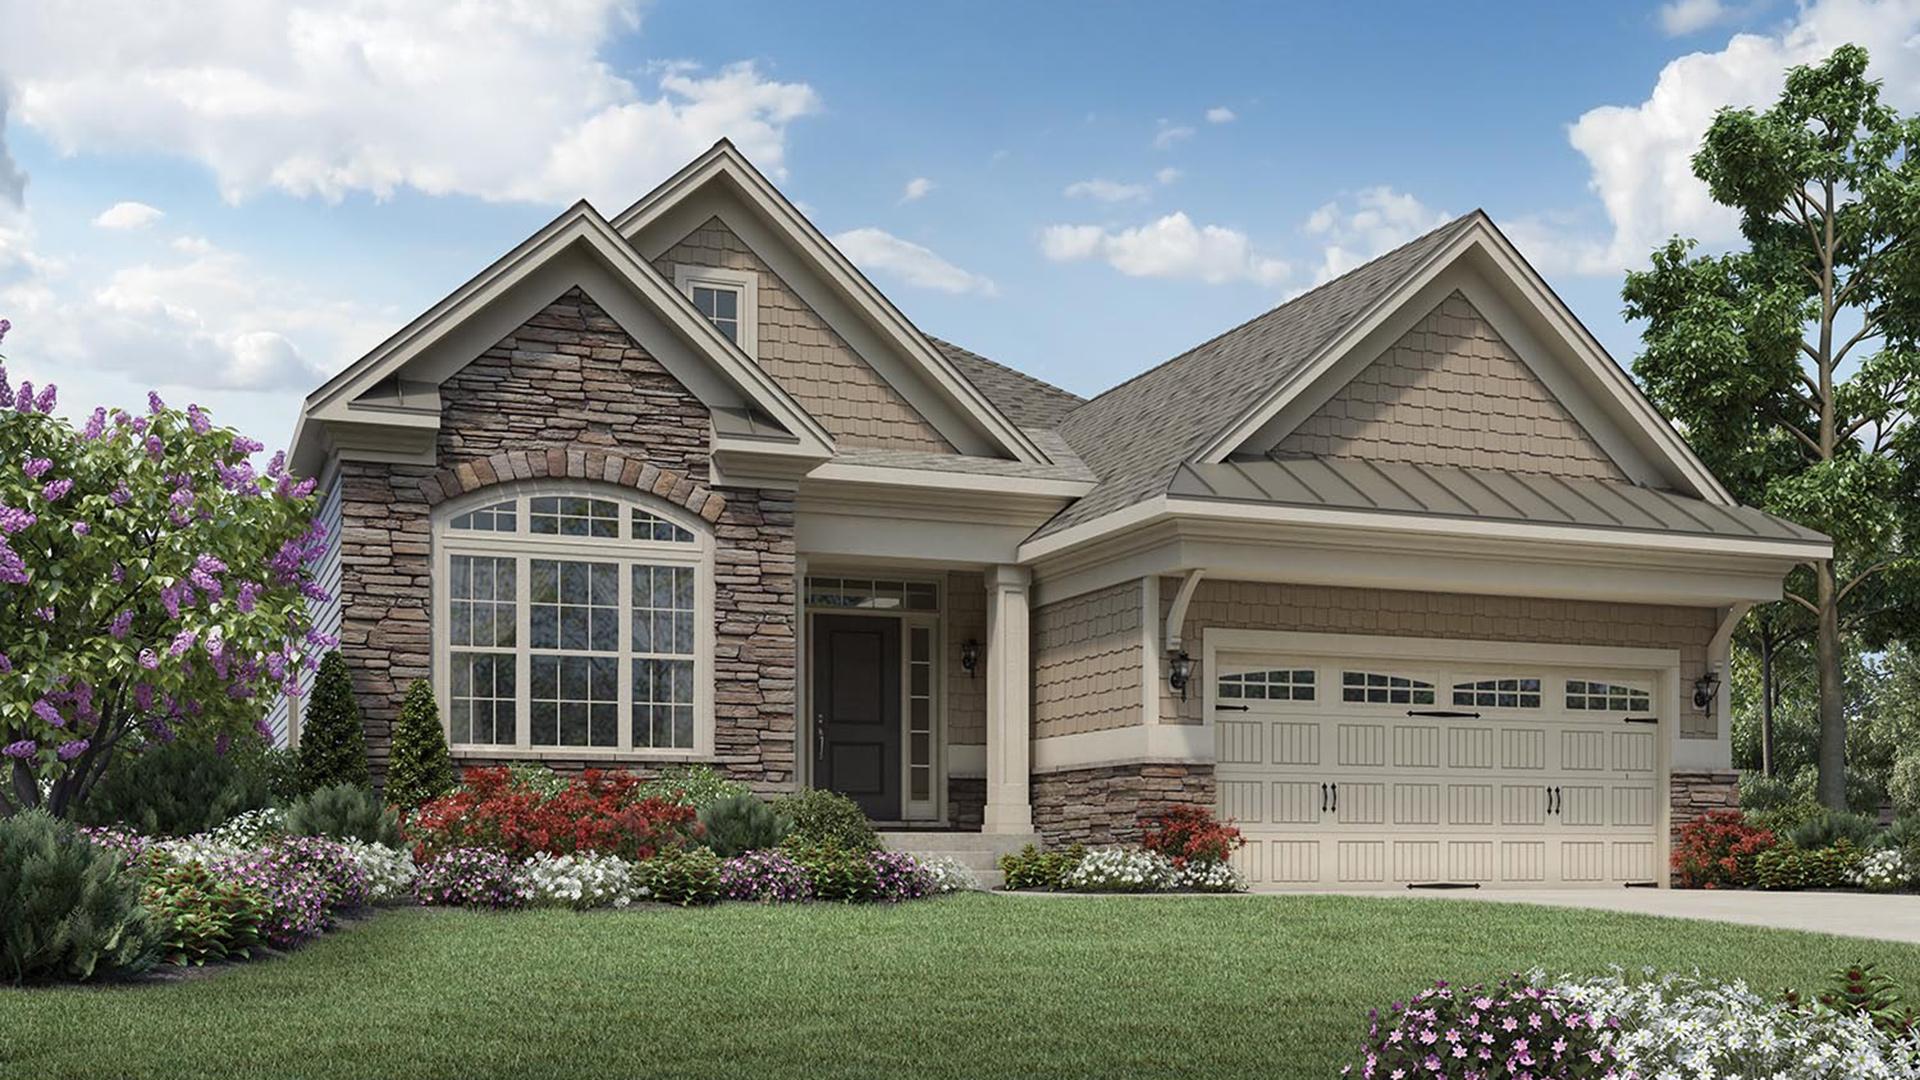 Regency at White Oak Creek | The Deerfield Home Design